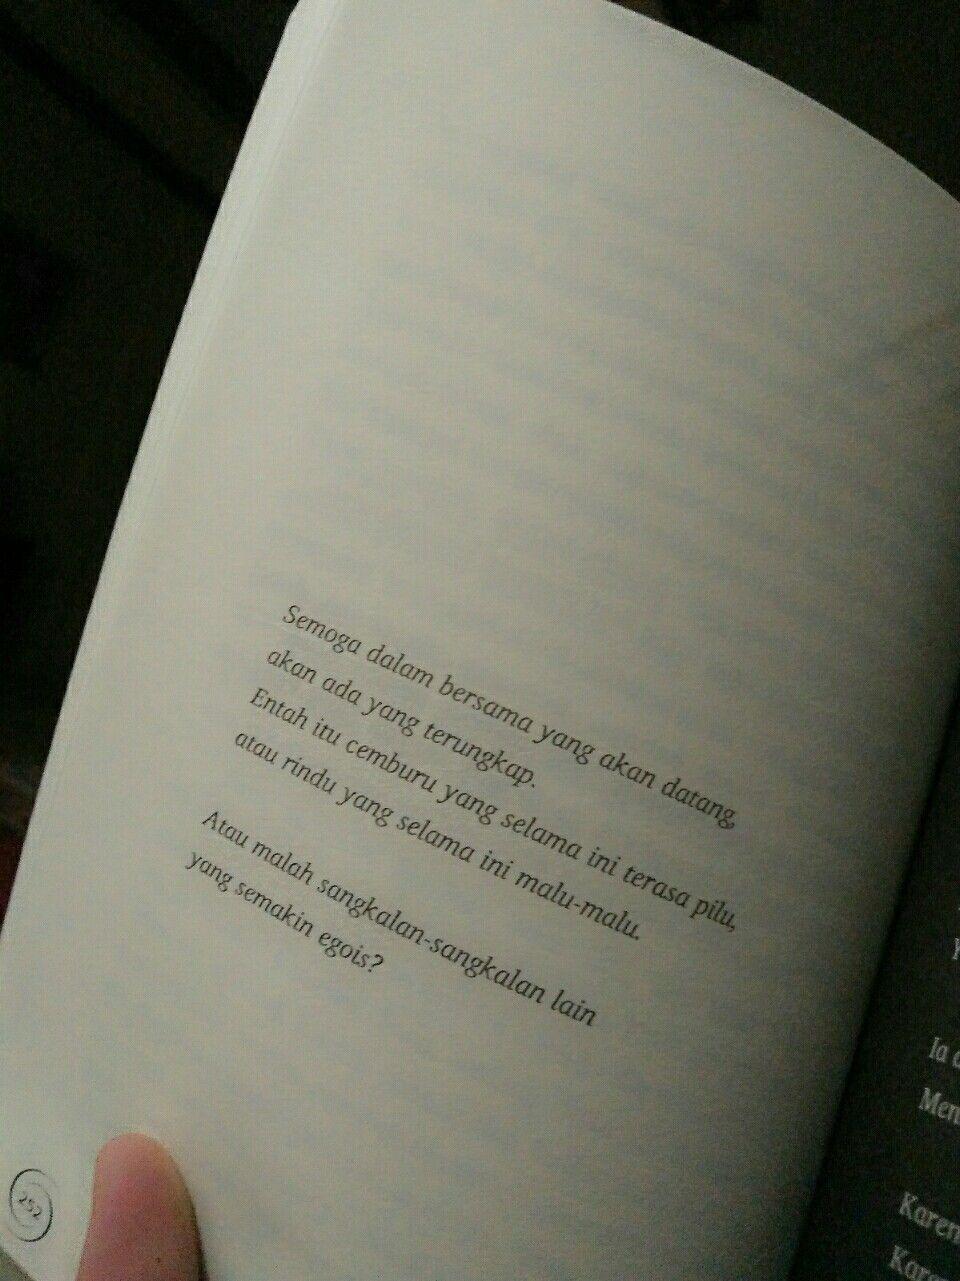 Kutipan Novel Remaja : kutipan, novel, remaja, Quotes, Novel, Indonesia, Celoteh, Bijak